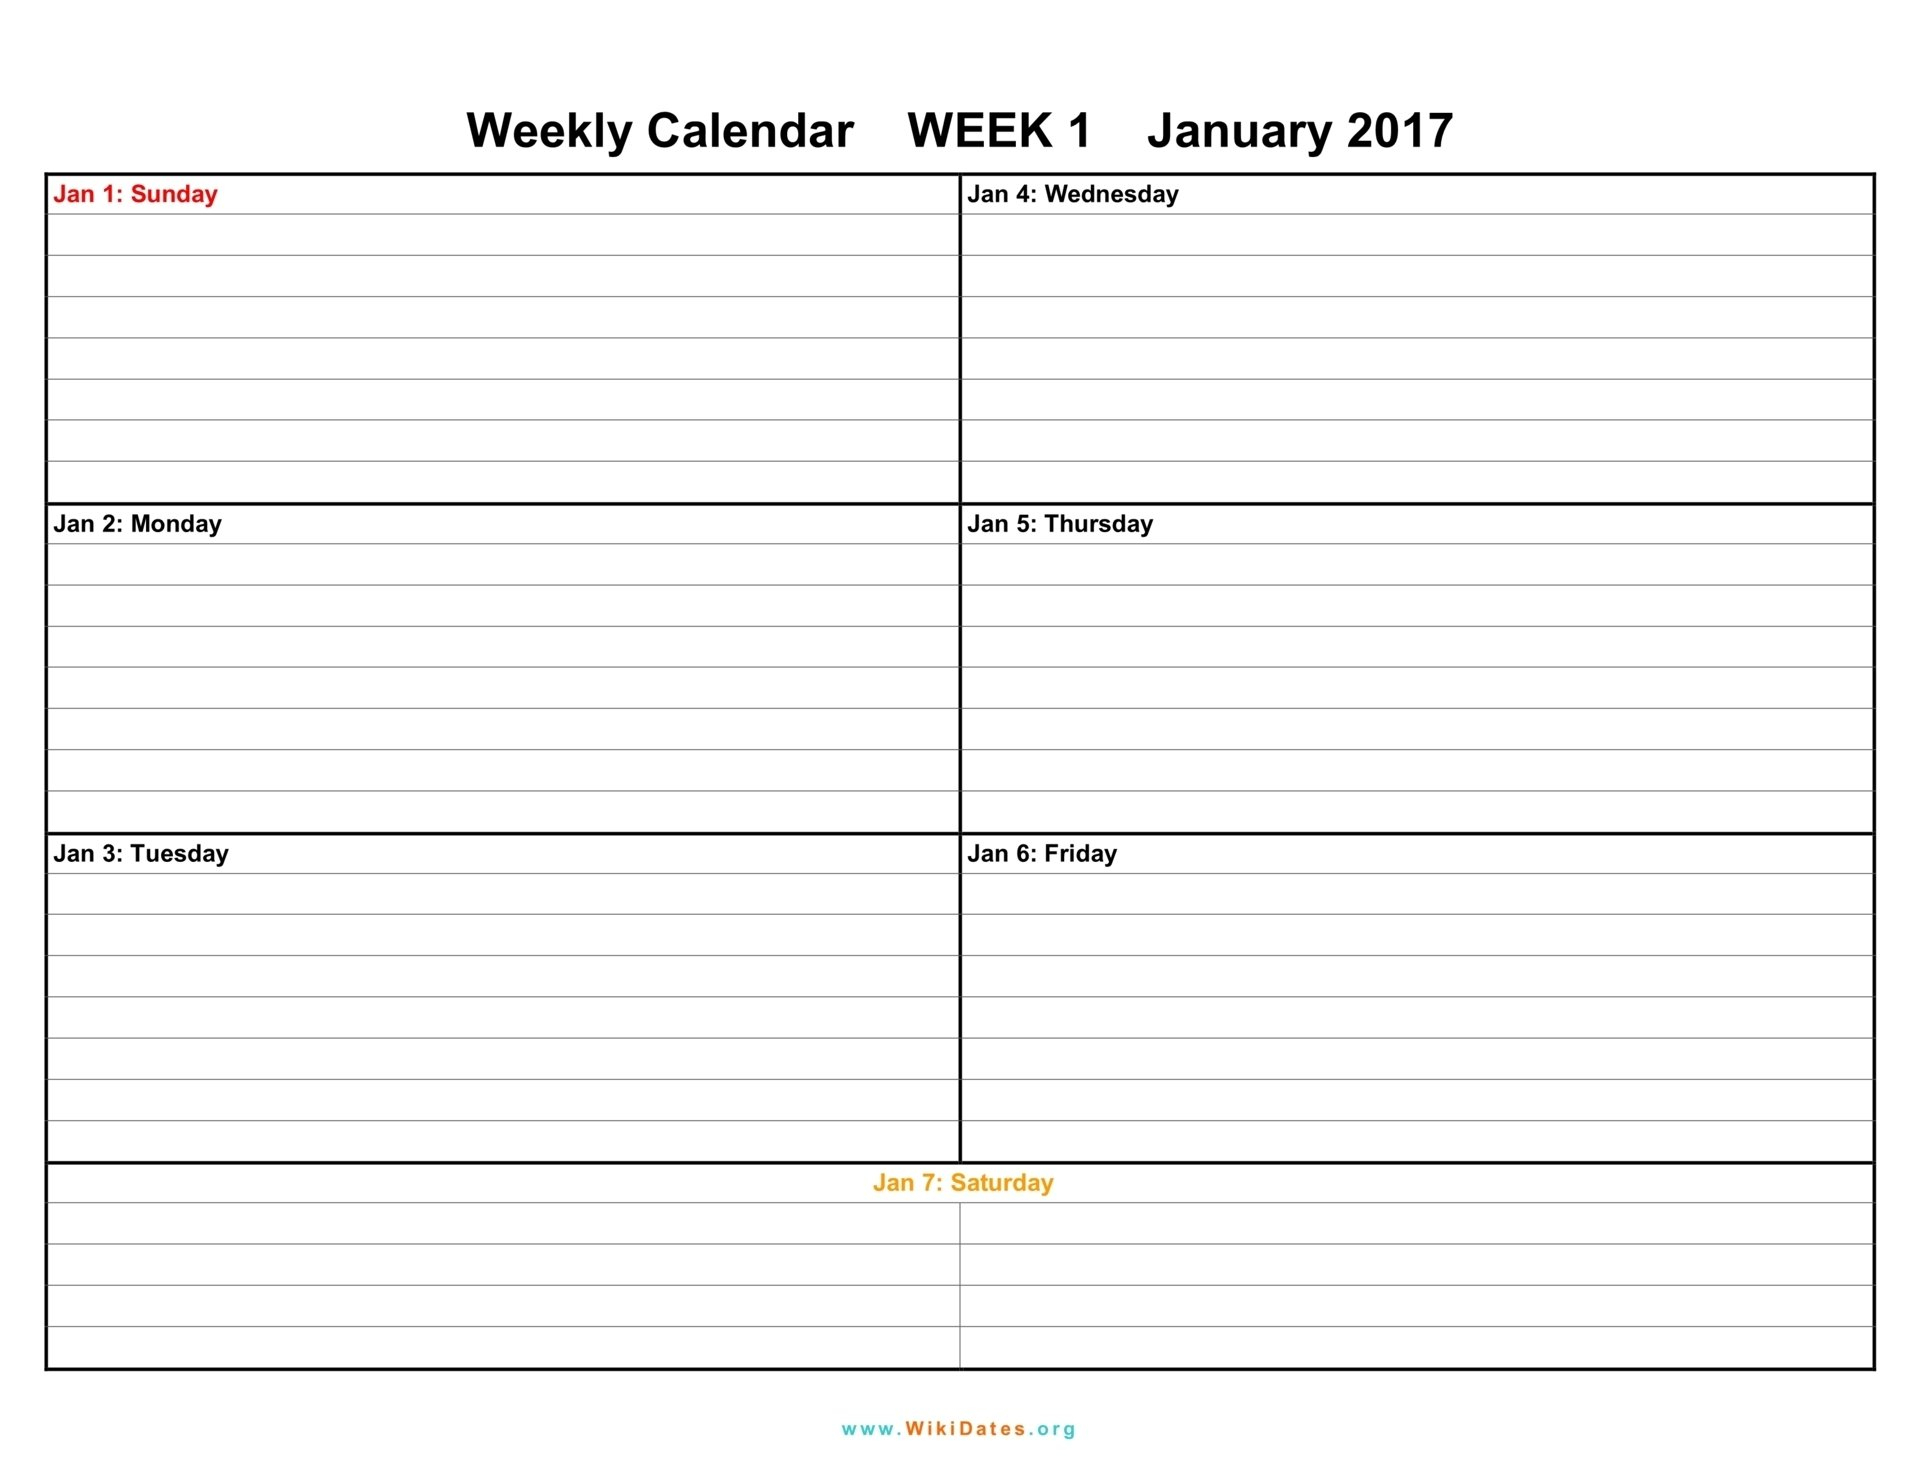 7 Day Weekly Planner Template Printable | Calendar 7 Day Blank Calendar Printable